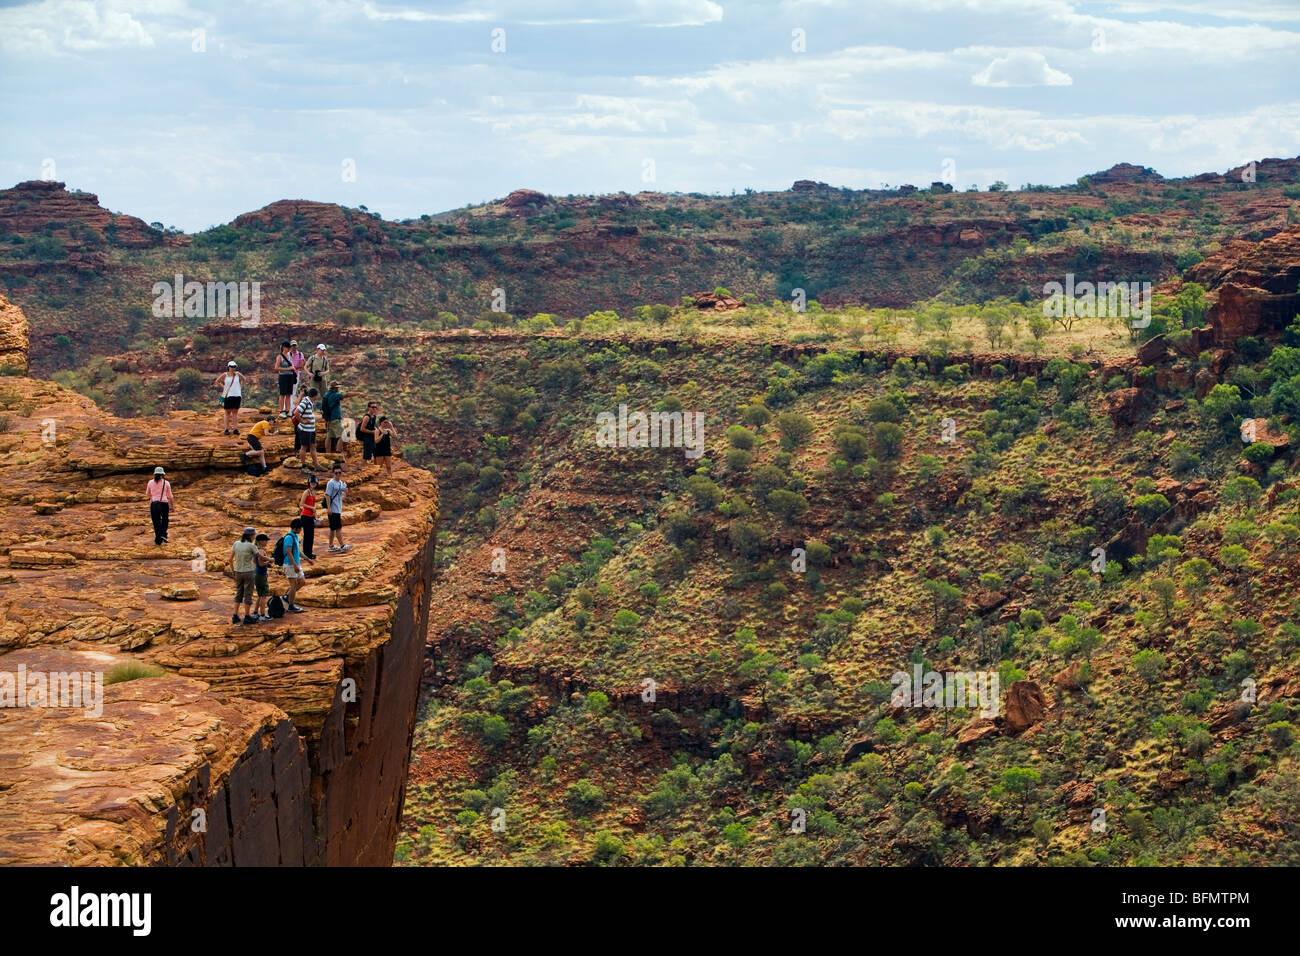 Australia, Northern Territory, Watarrka (Kings Canyon) National Park. Hikers on the canyon's edge. (PR) - Stock Image